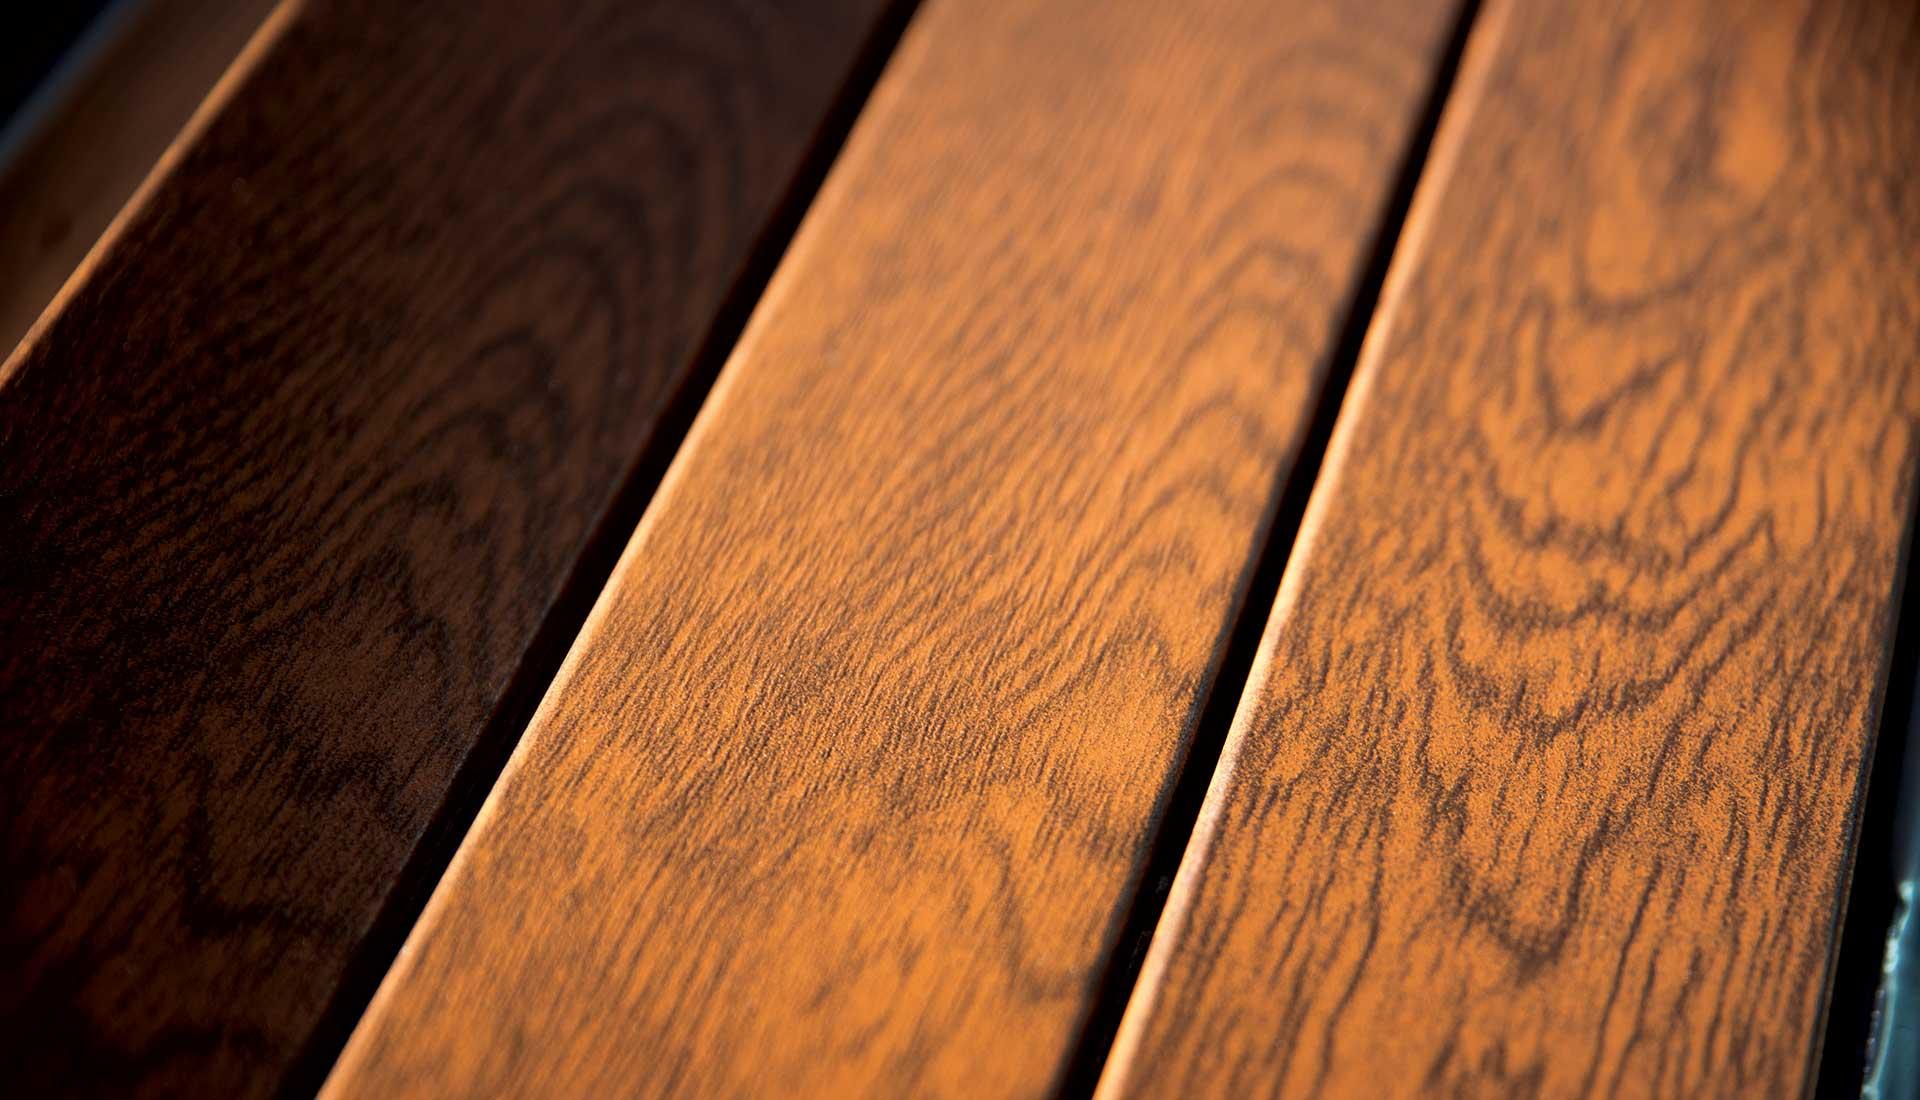 DFV Australia, Wood Effect Powder Coating Technology